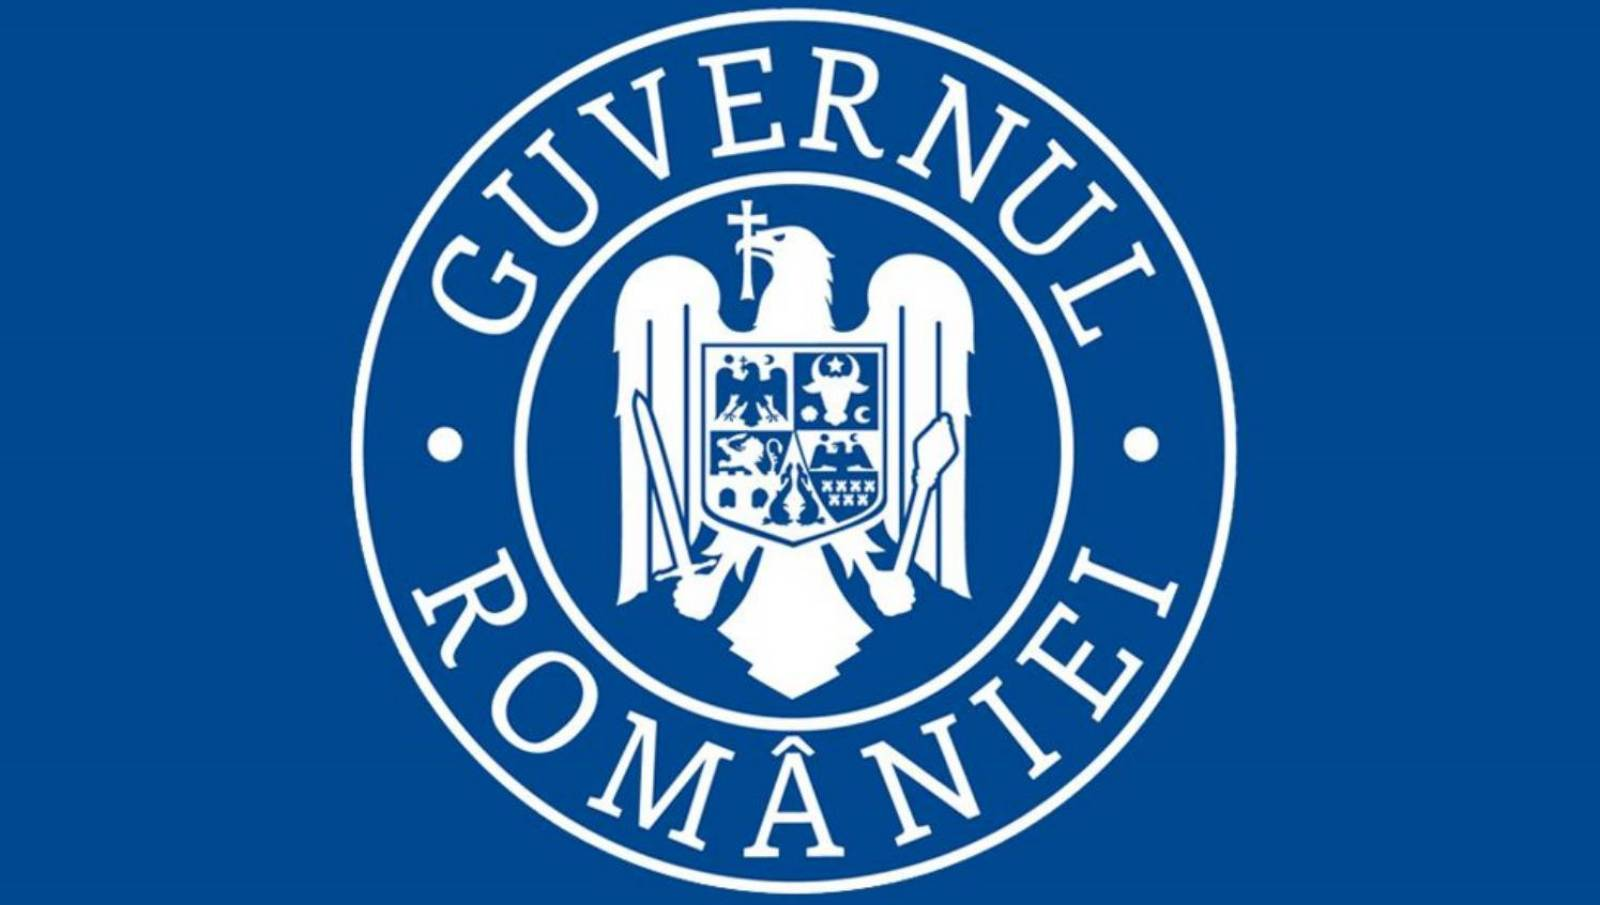 Guvernul Romaniei fraudele saptamanii online